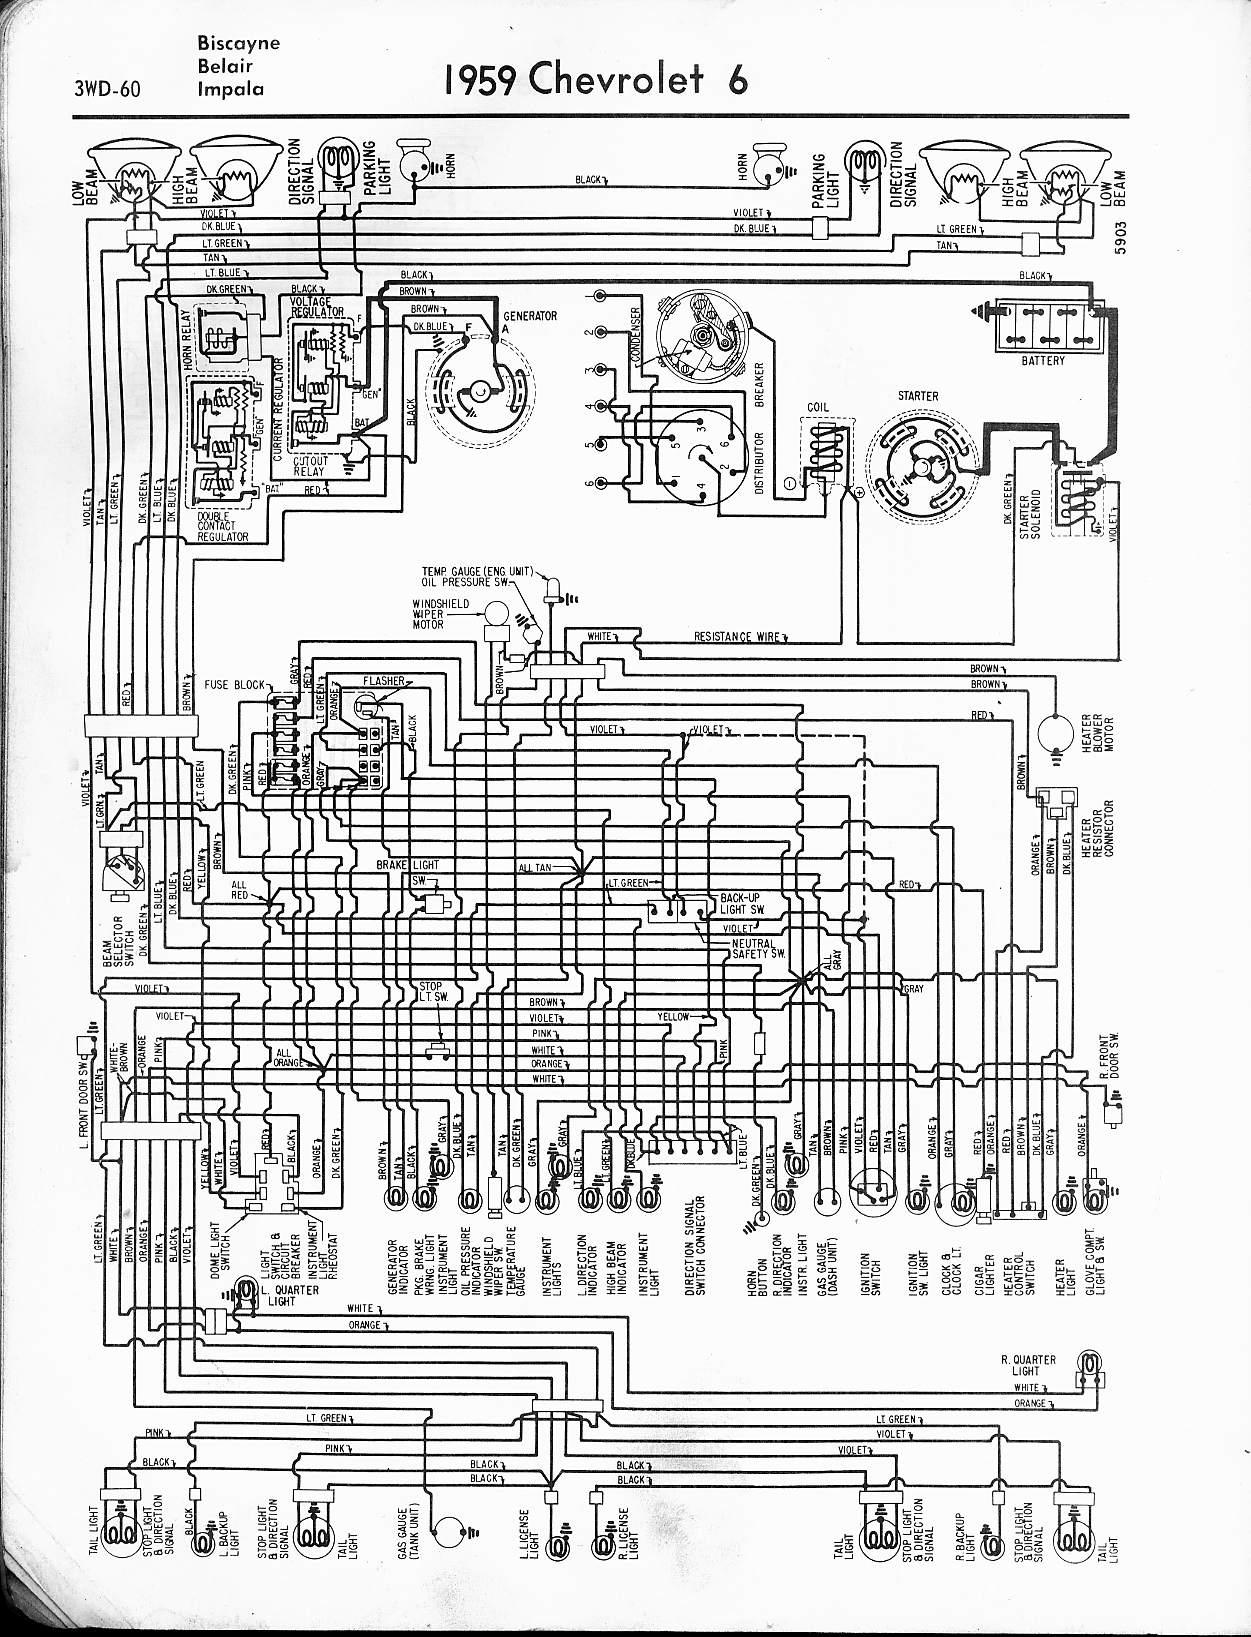 Prime 59 Chevy Wiring Diagram Wiring Diagram Wiring Cloud Xortanetembamohammedshrineorg